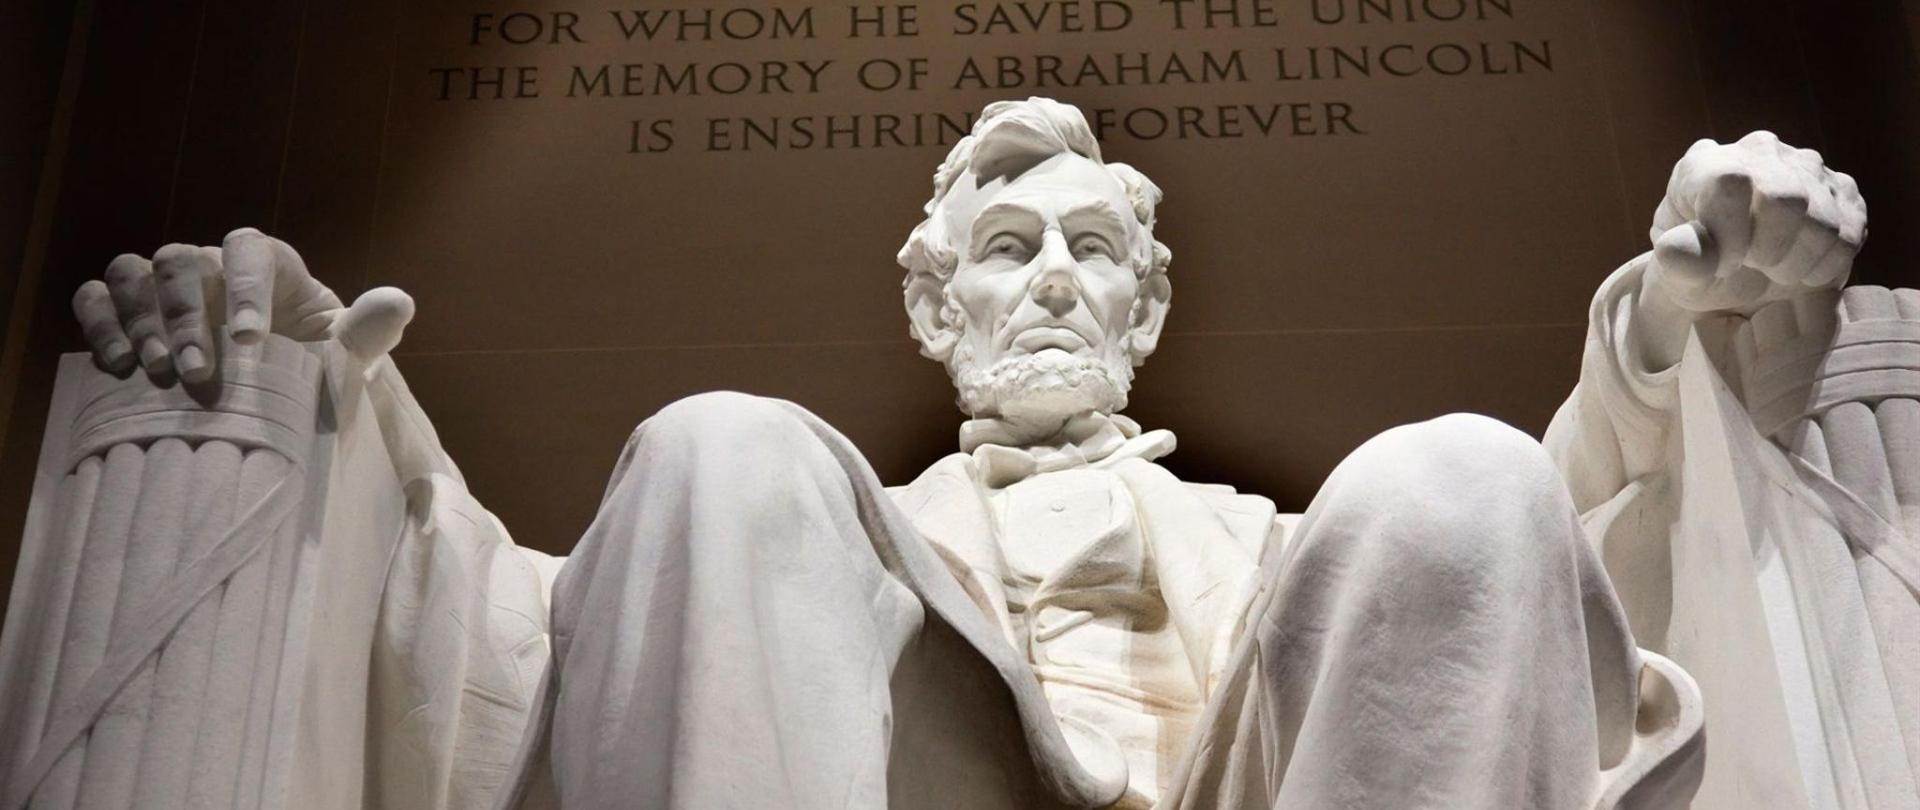 линкольн-monument.jpg